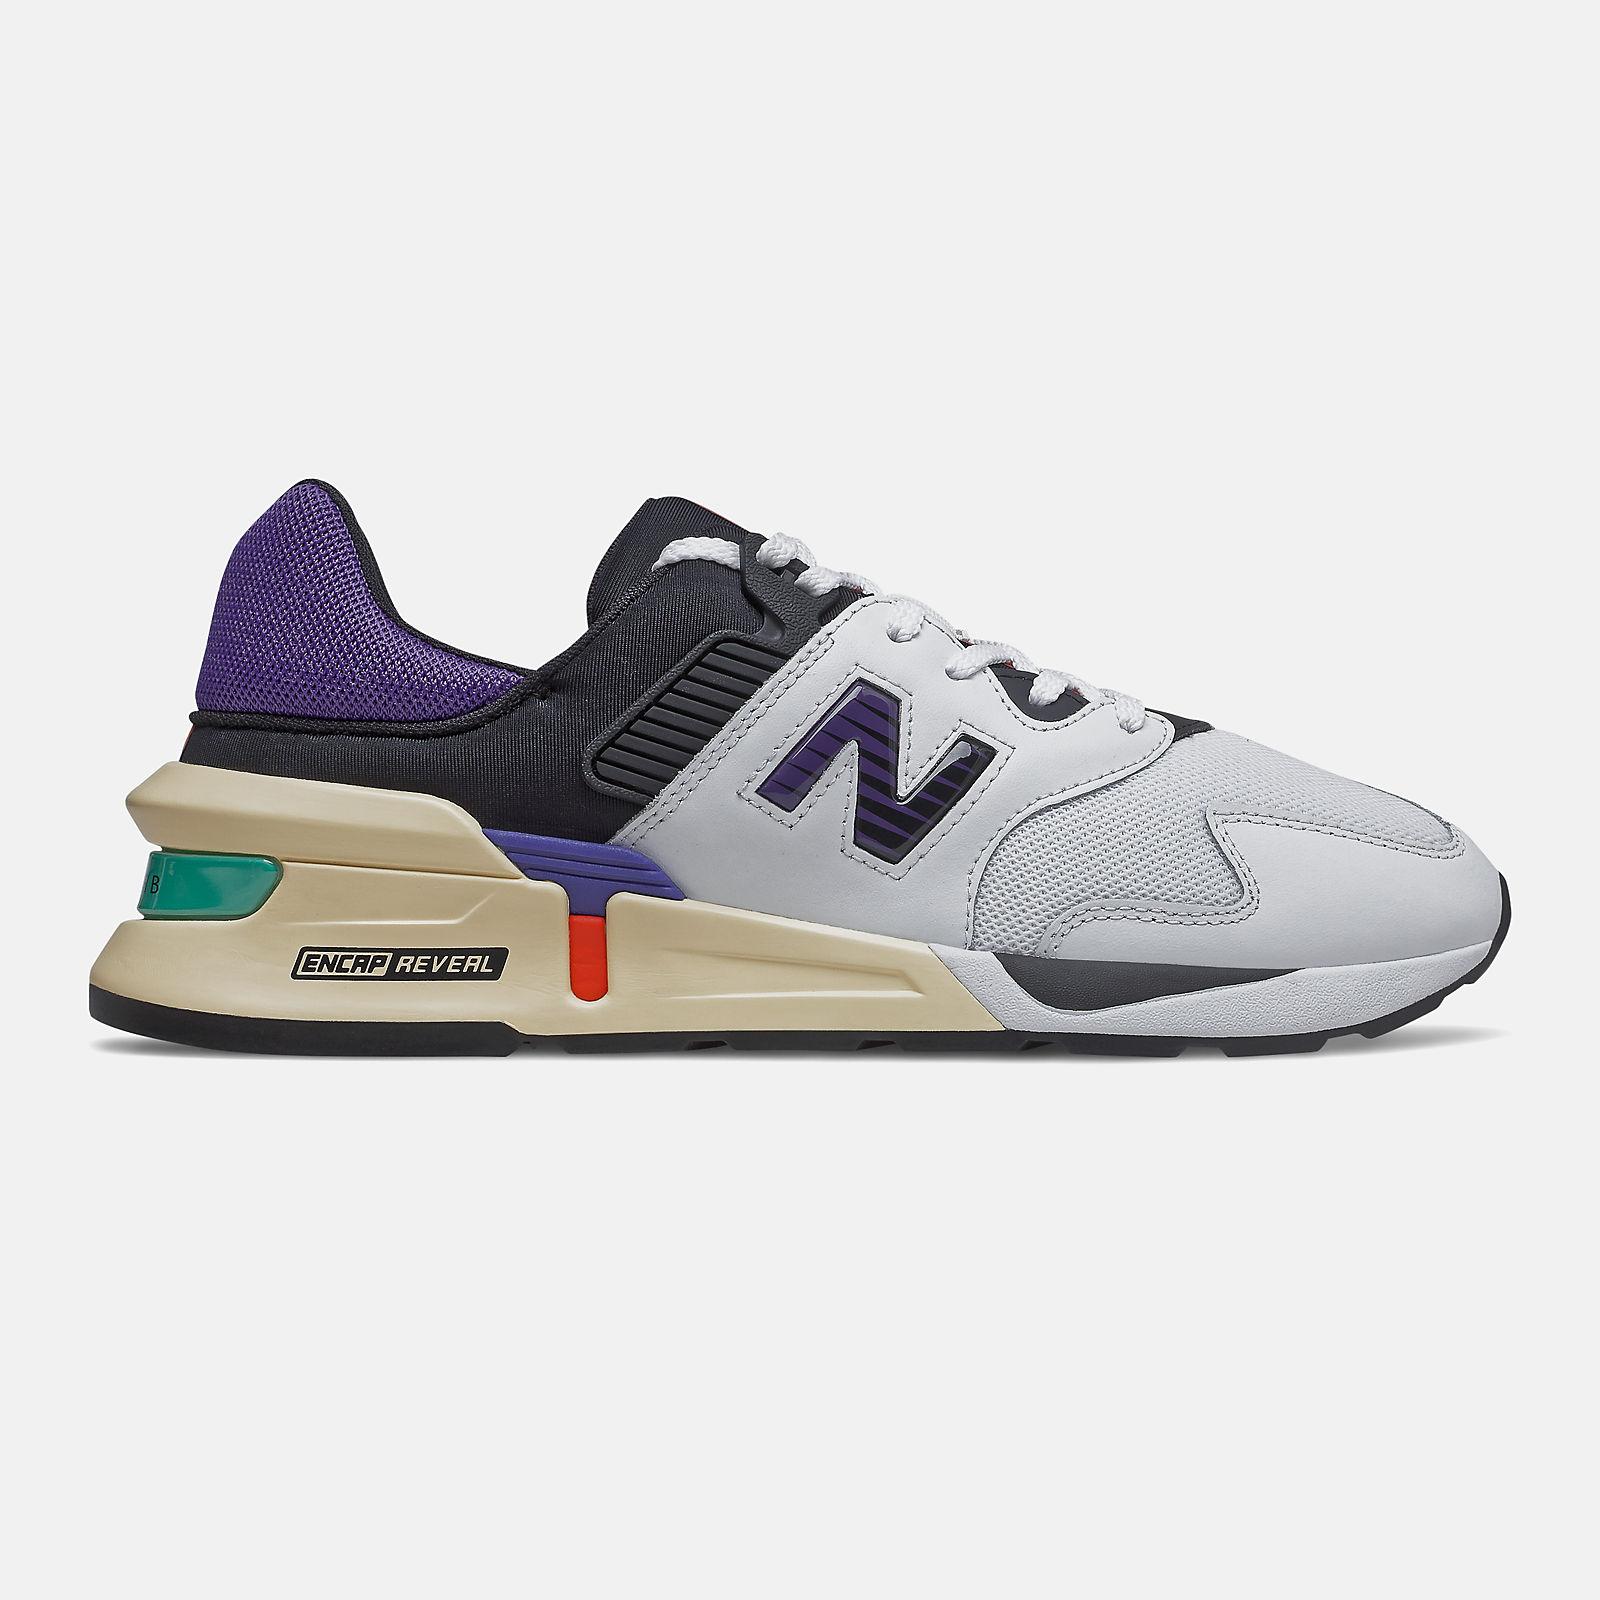 Men's 997 Sport Lifestyle Shoes - New Balance